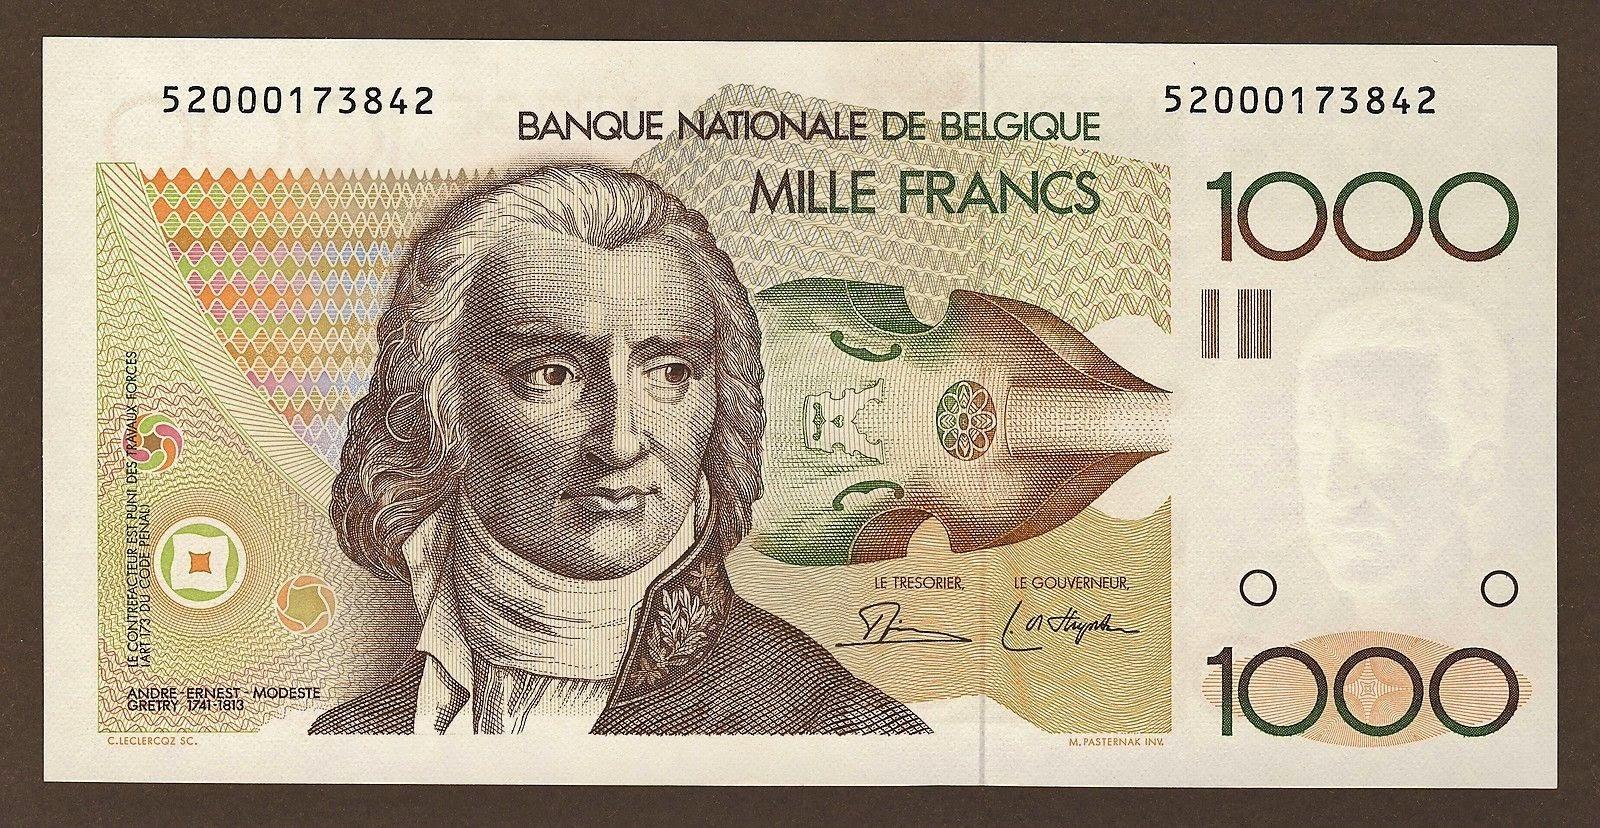 Belgium Banknotes 1000 Francs banknote 1980 composer Andre Gretry